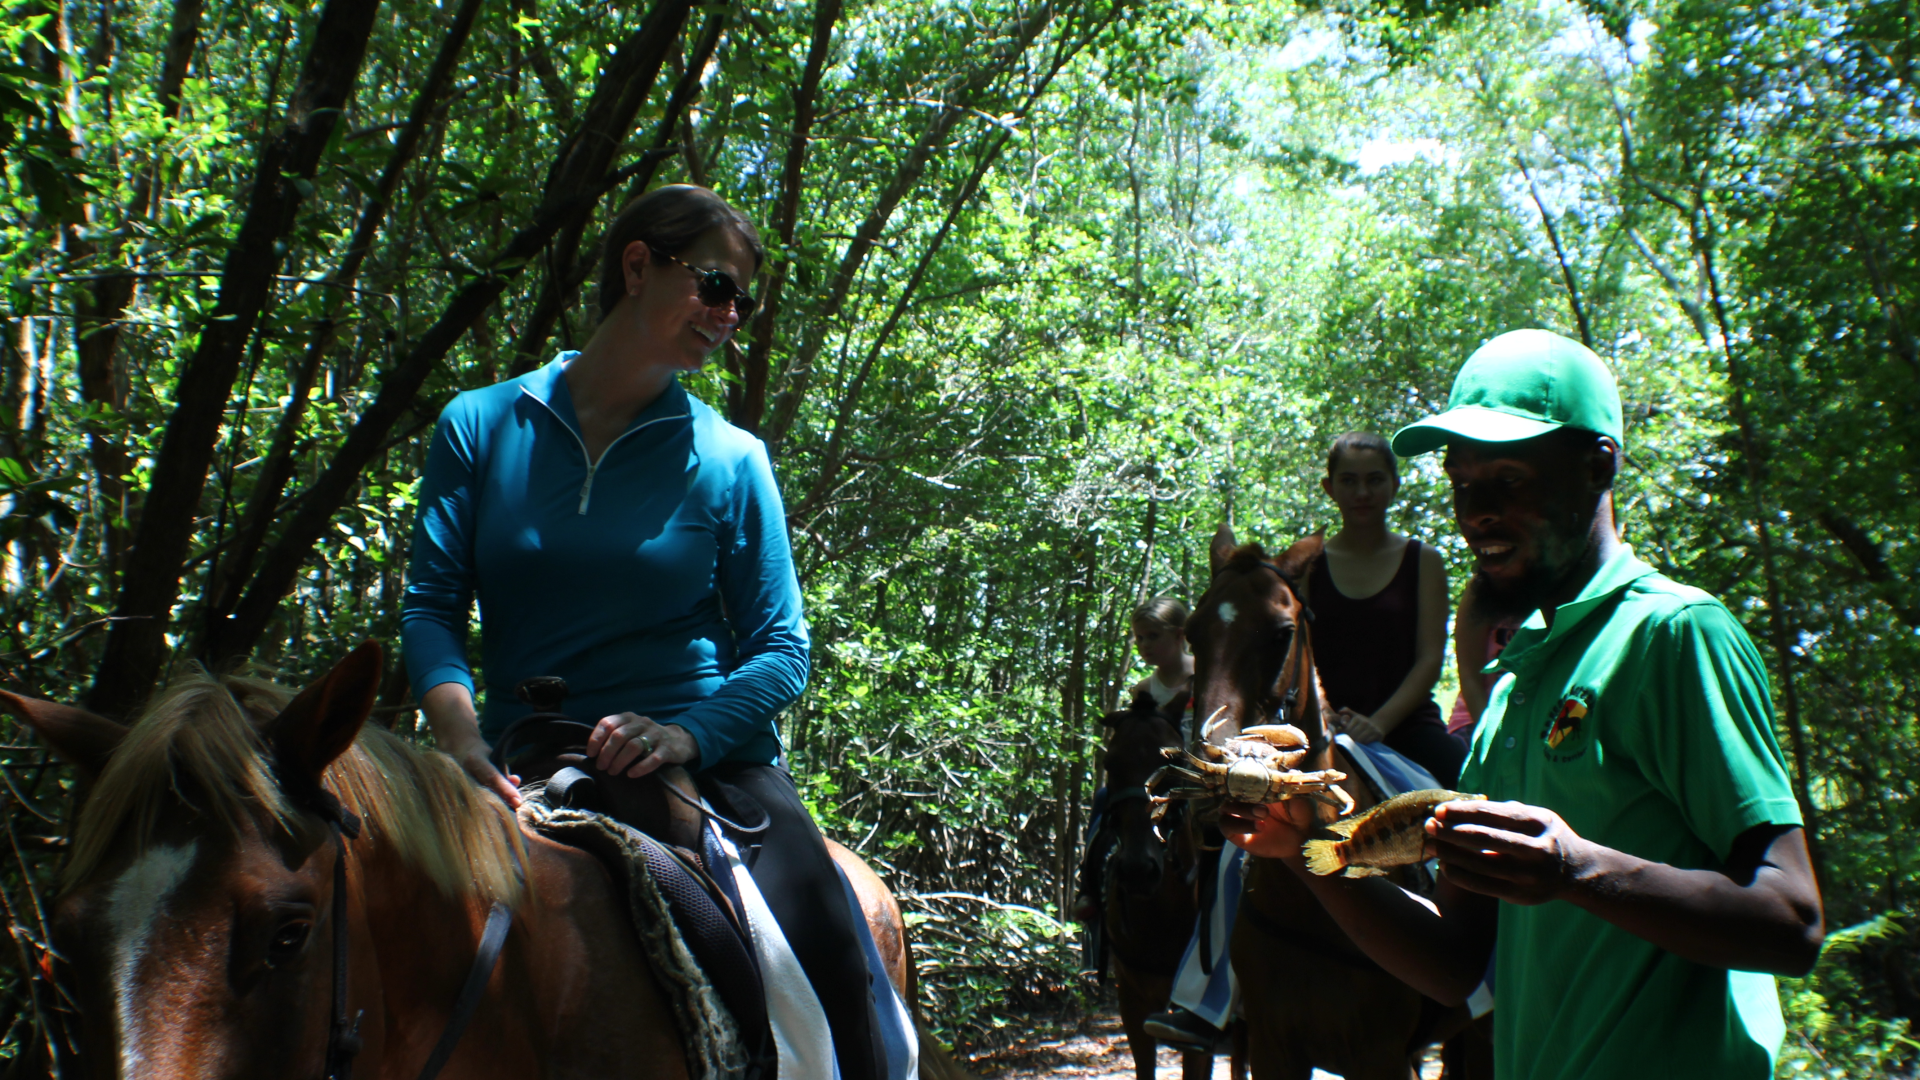 Reggae Horseback Riding at Wild Crocodile Adventure Park